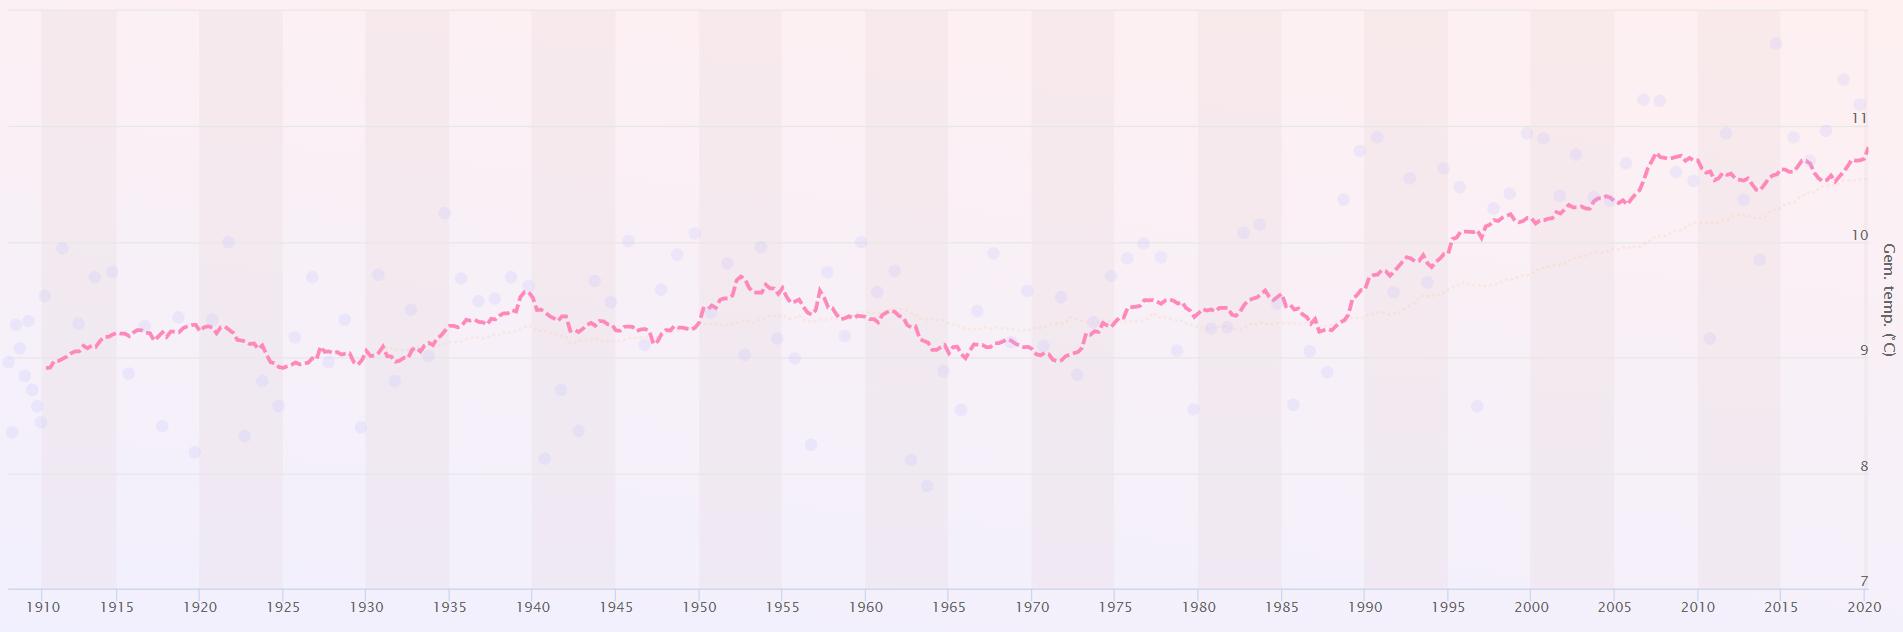 Temperatuursprong 1988